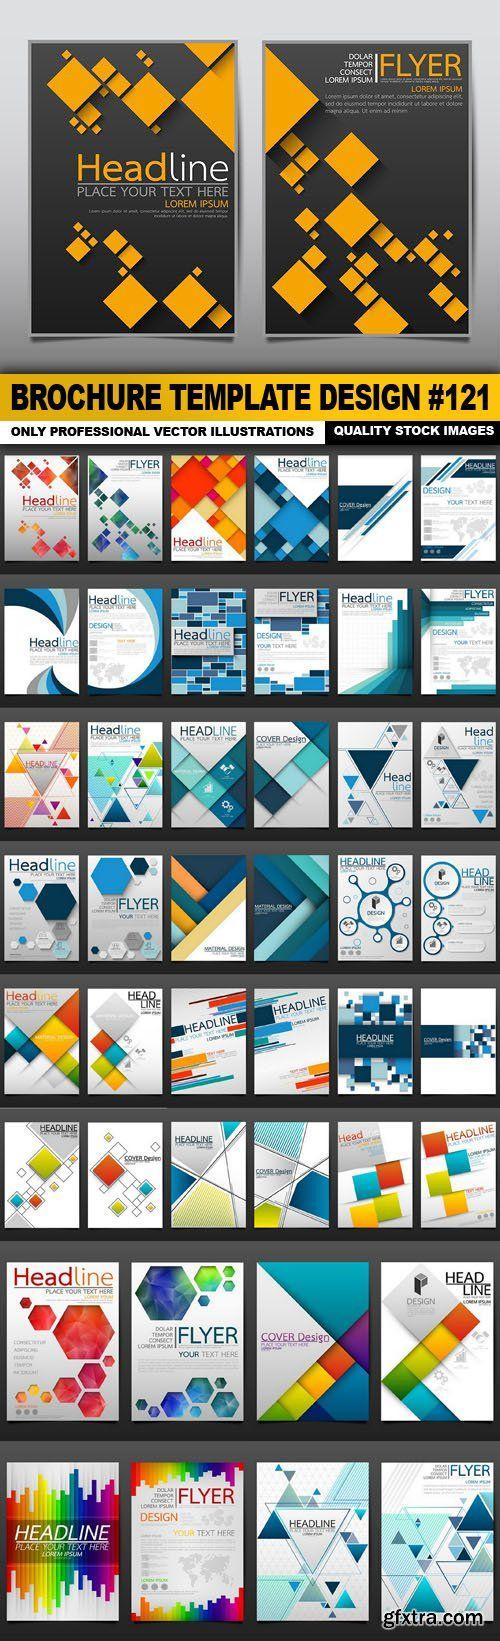 Brochure Template Design #121 - 24 Vector http://webtutorsliv.ml/threads/brochure-template-design-121-24-vector.44004/